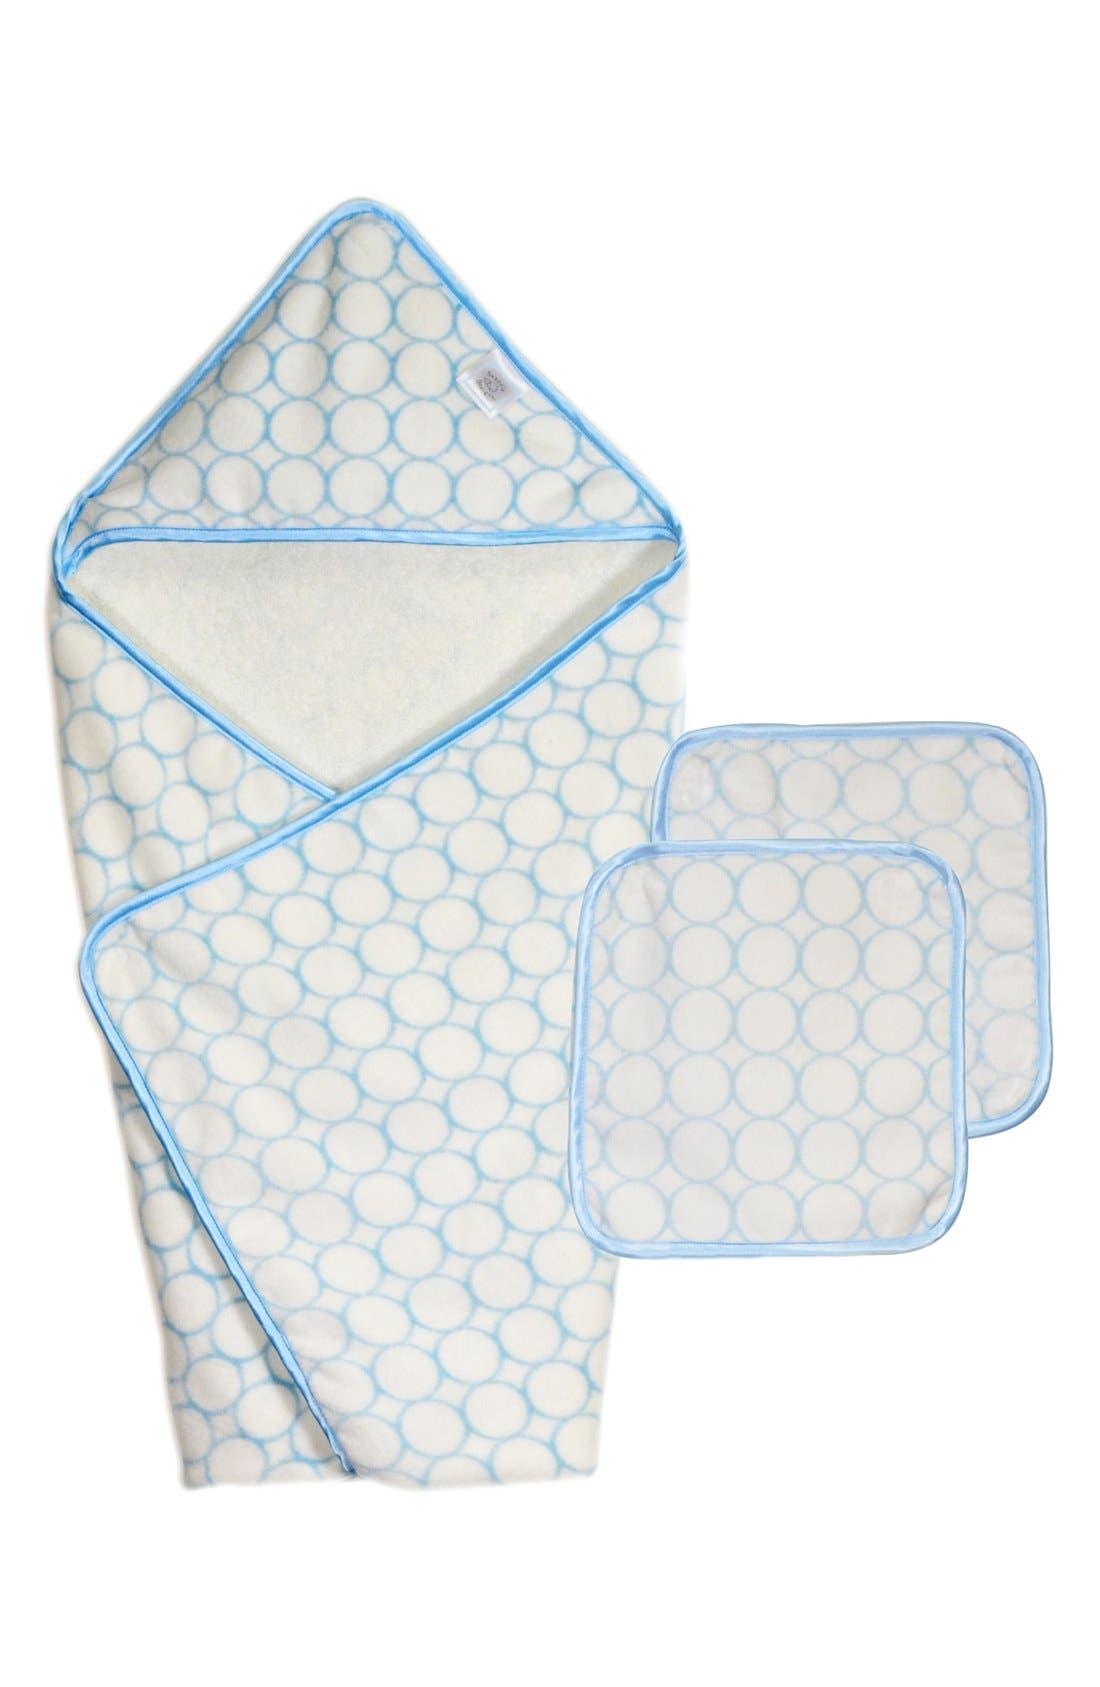 Alternate Image 1 Selected - Swaddle Designs Organic Turkish Cotton Hooded Towel & Washcloths